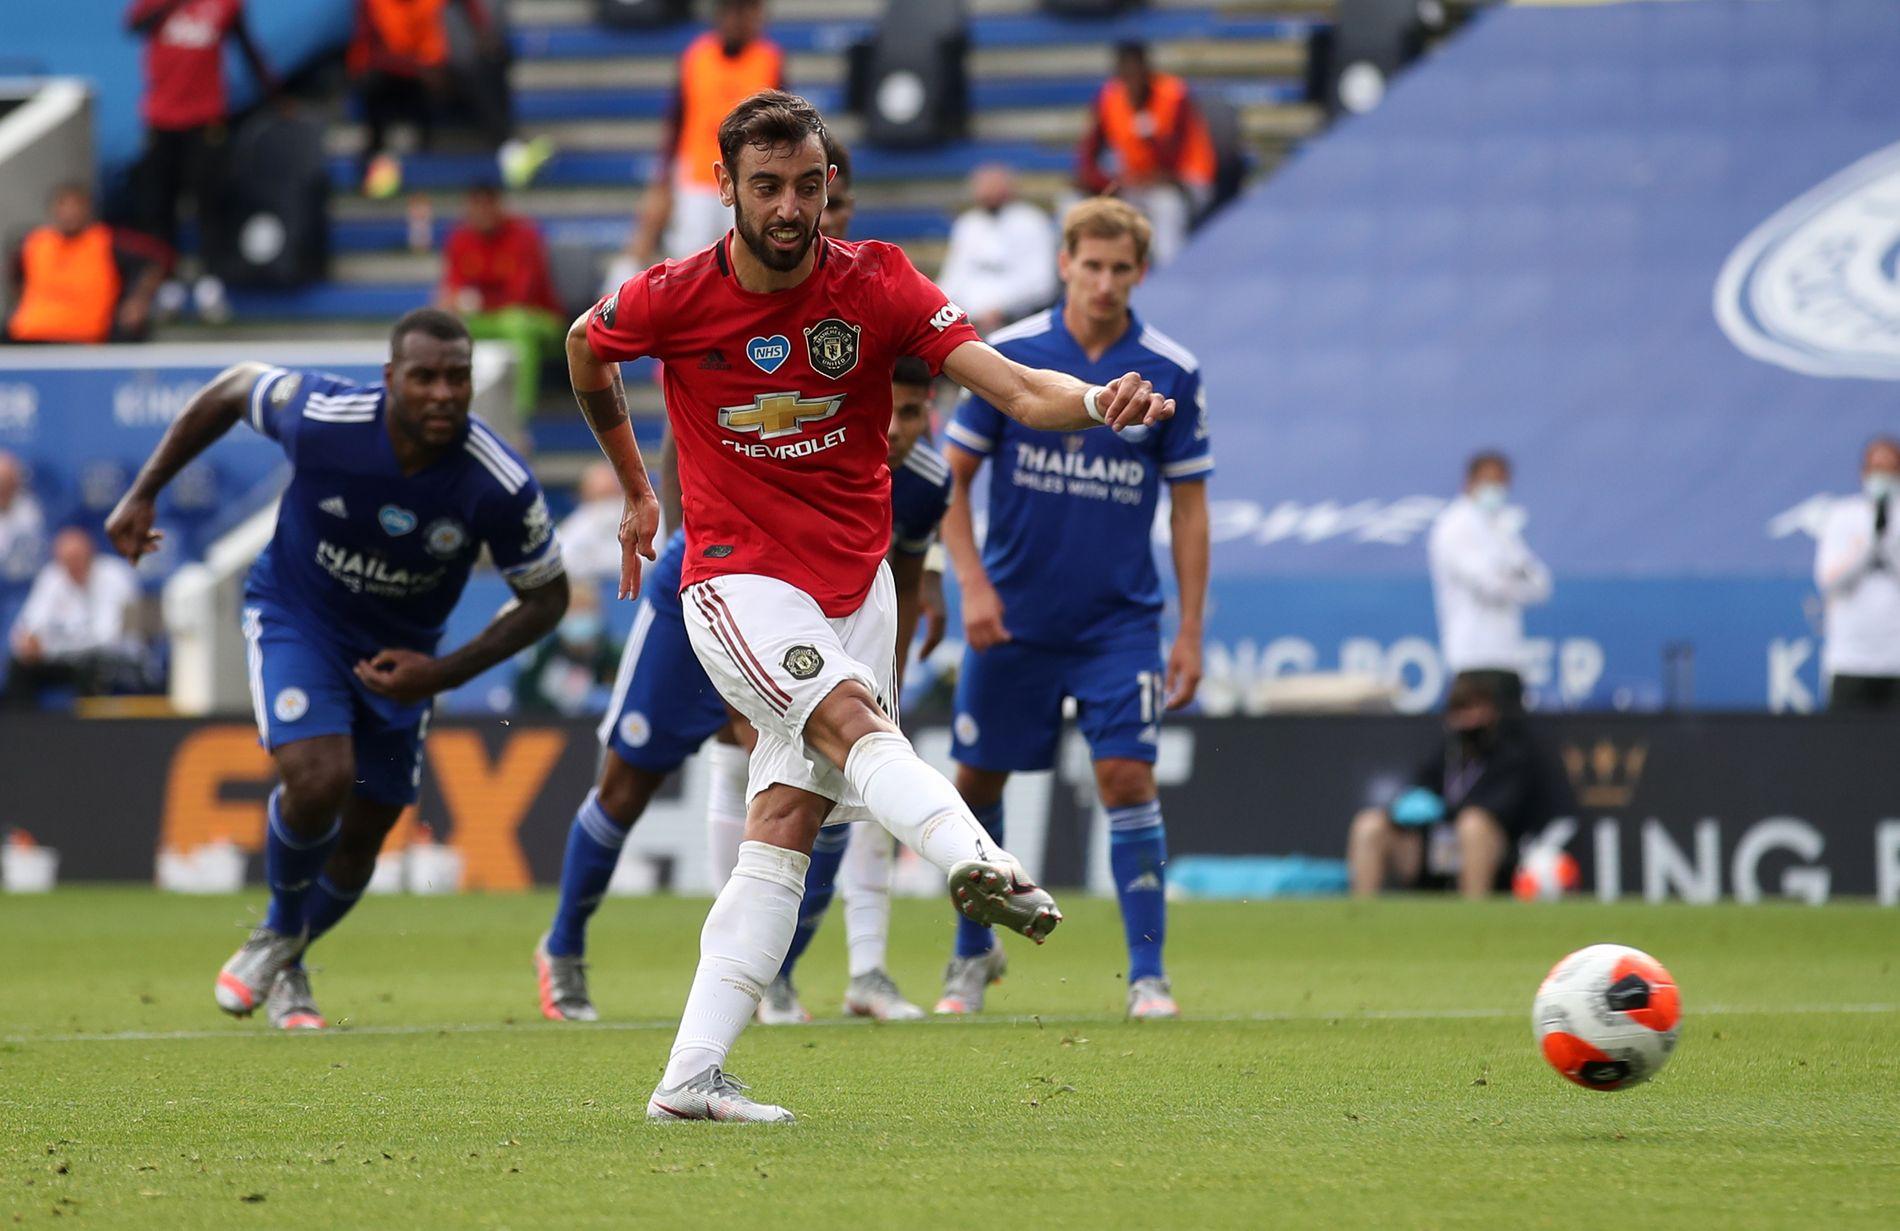 Solskjær og Manchester United til Champions League: En